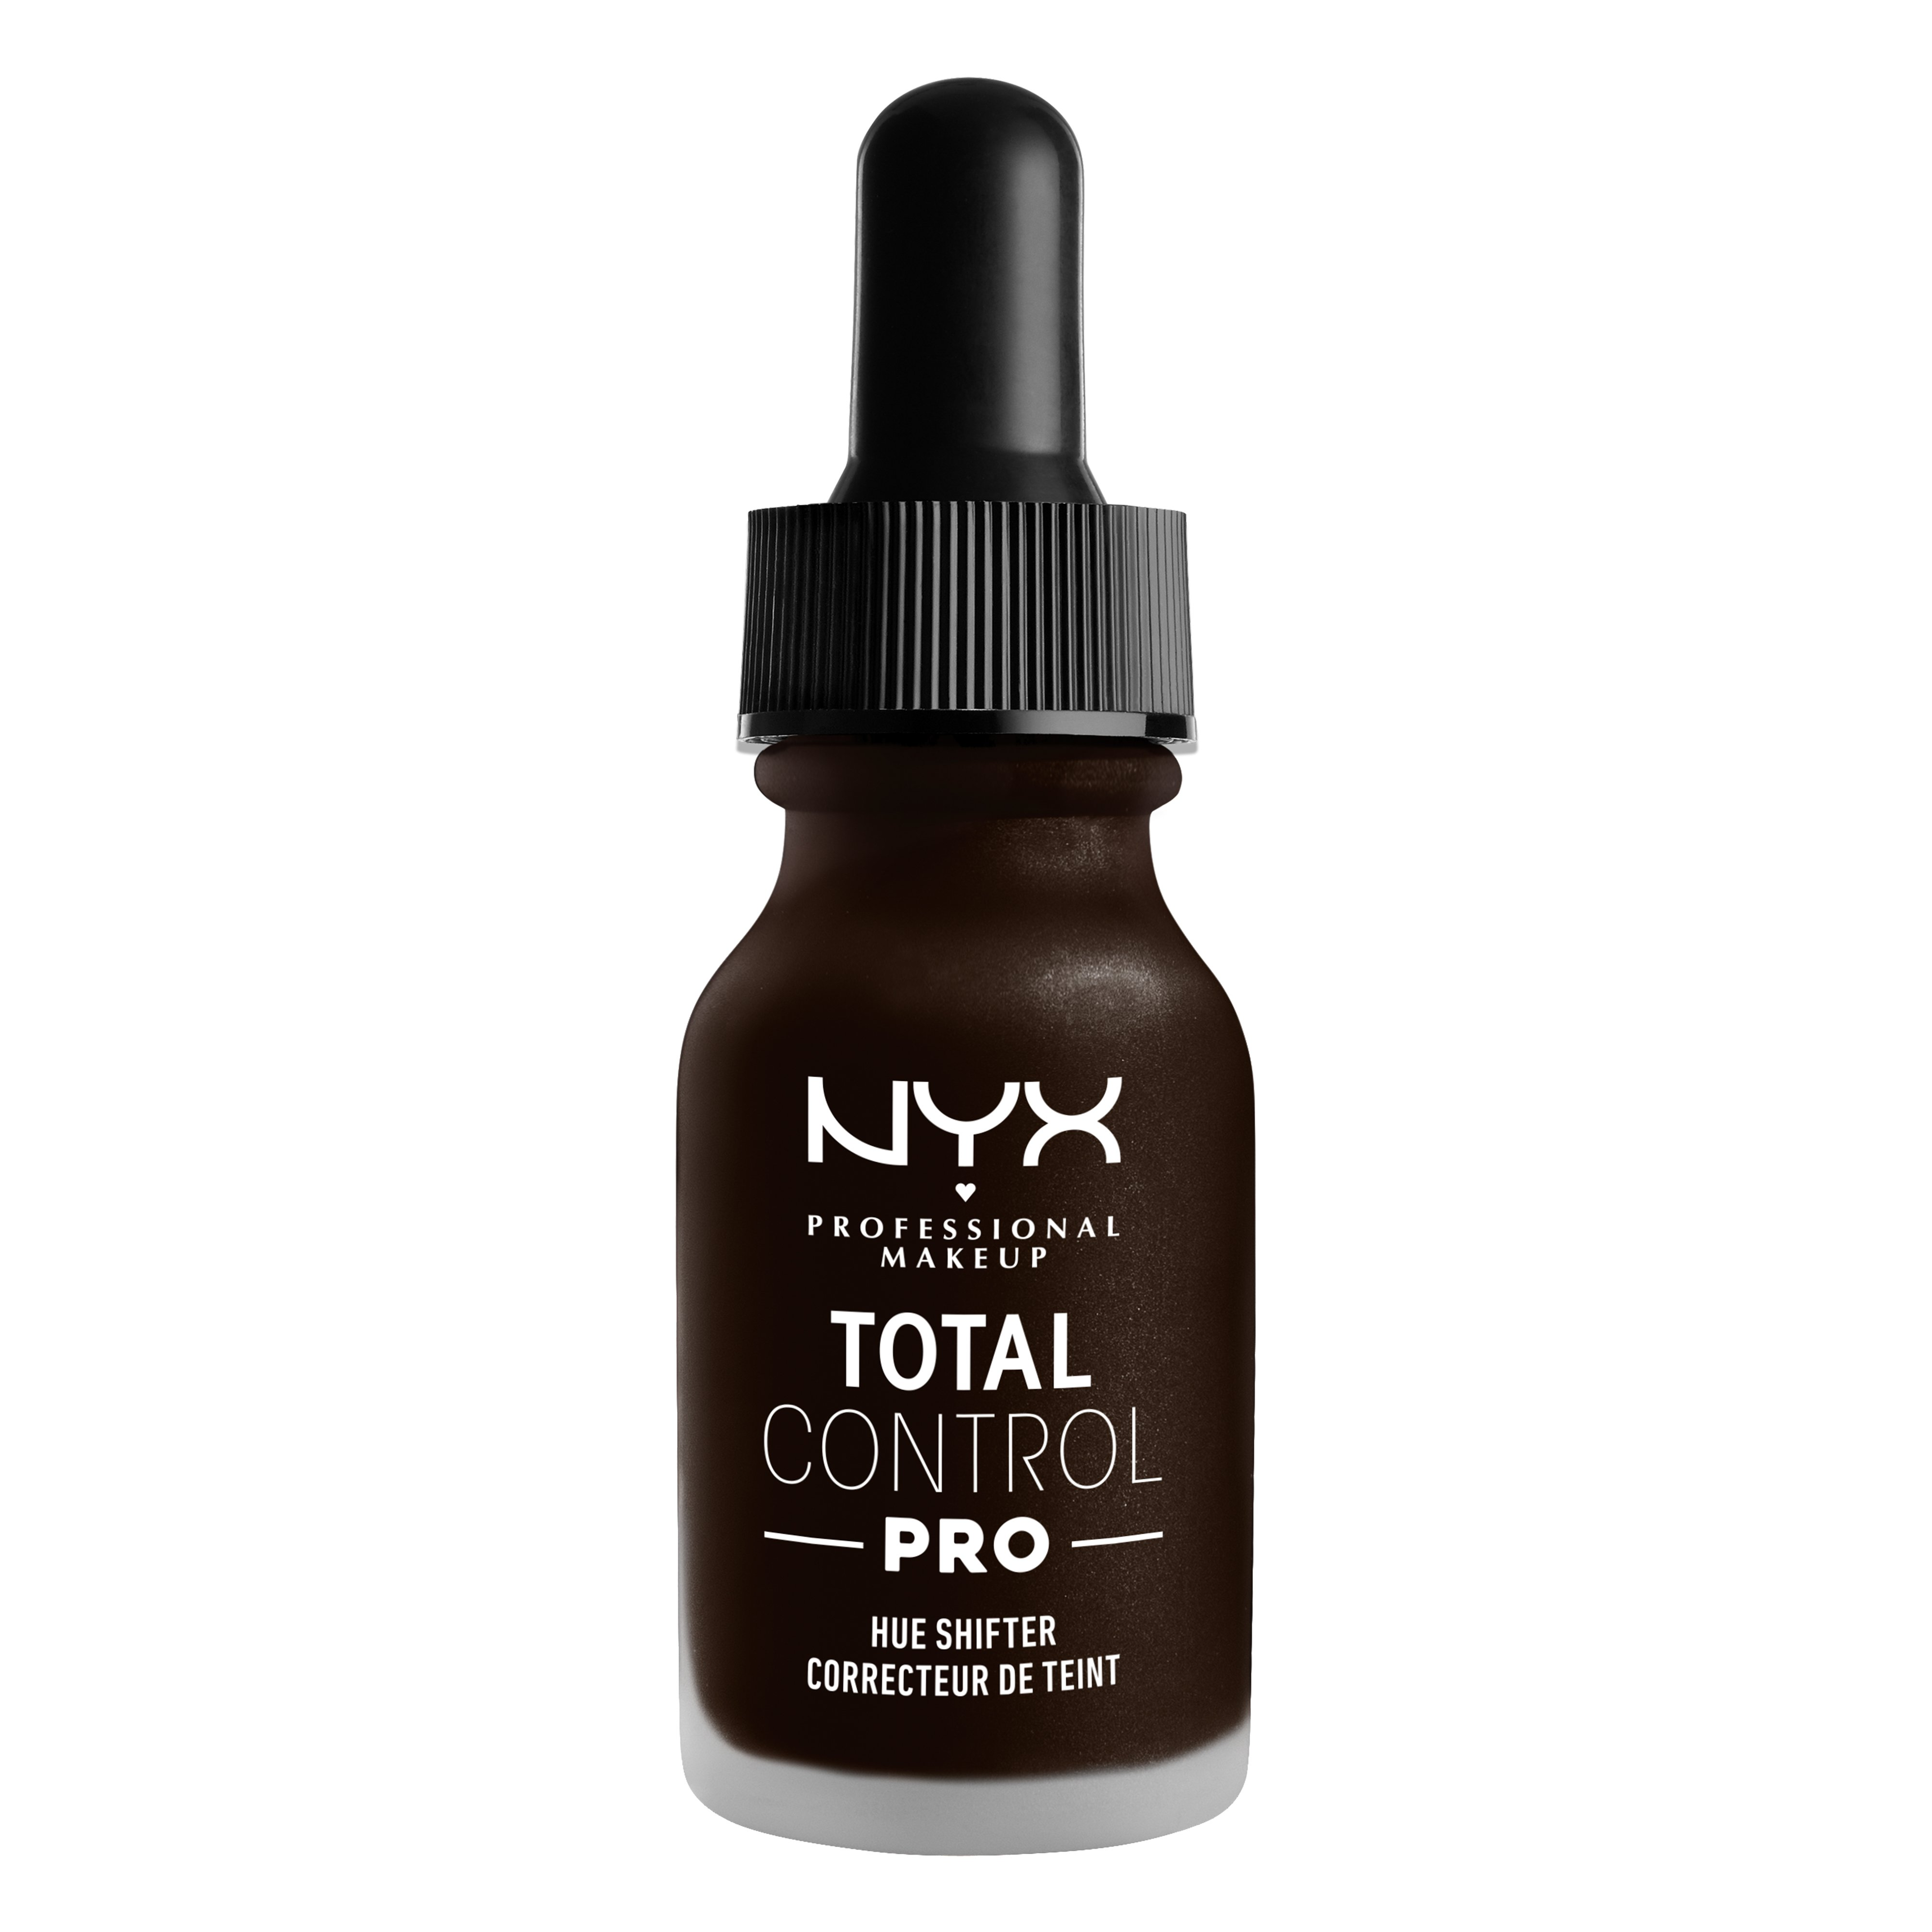 NYX Professional Makeup - Total Control Pro Hue Shifter - Dark